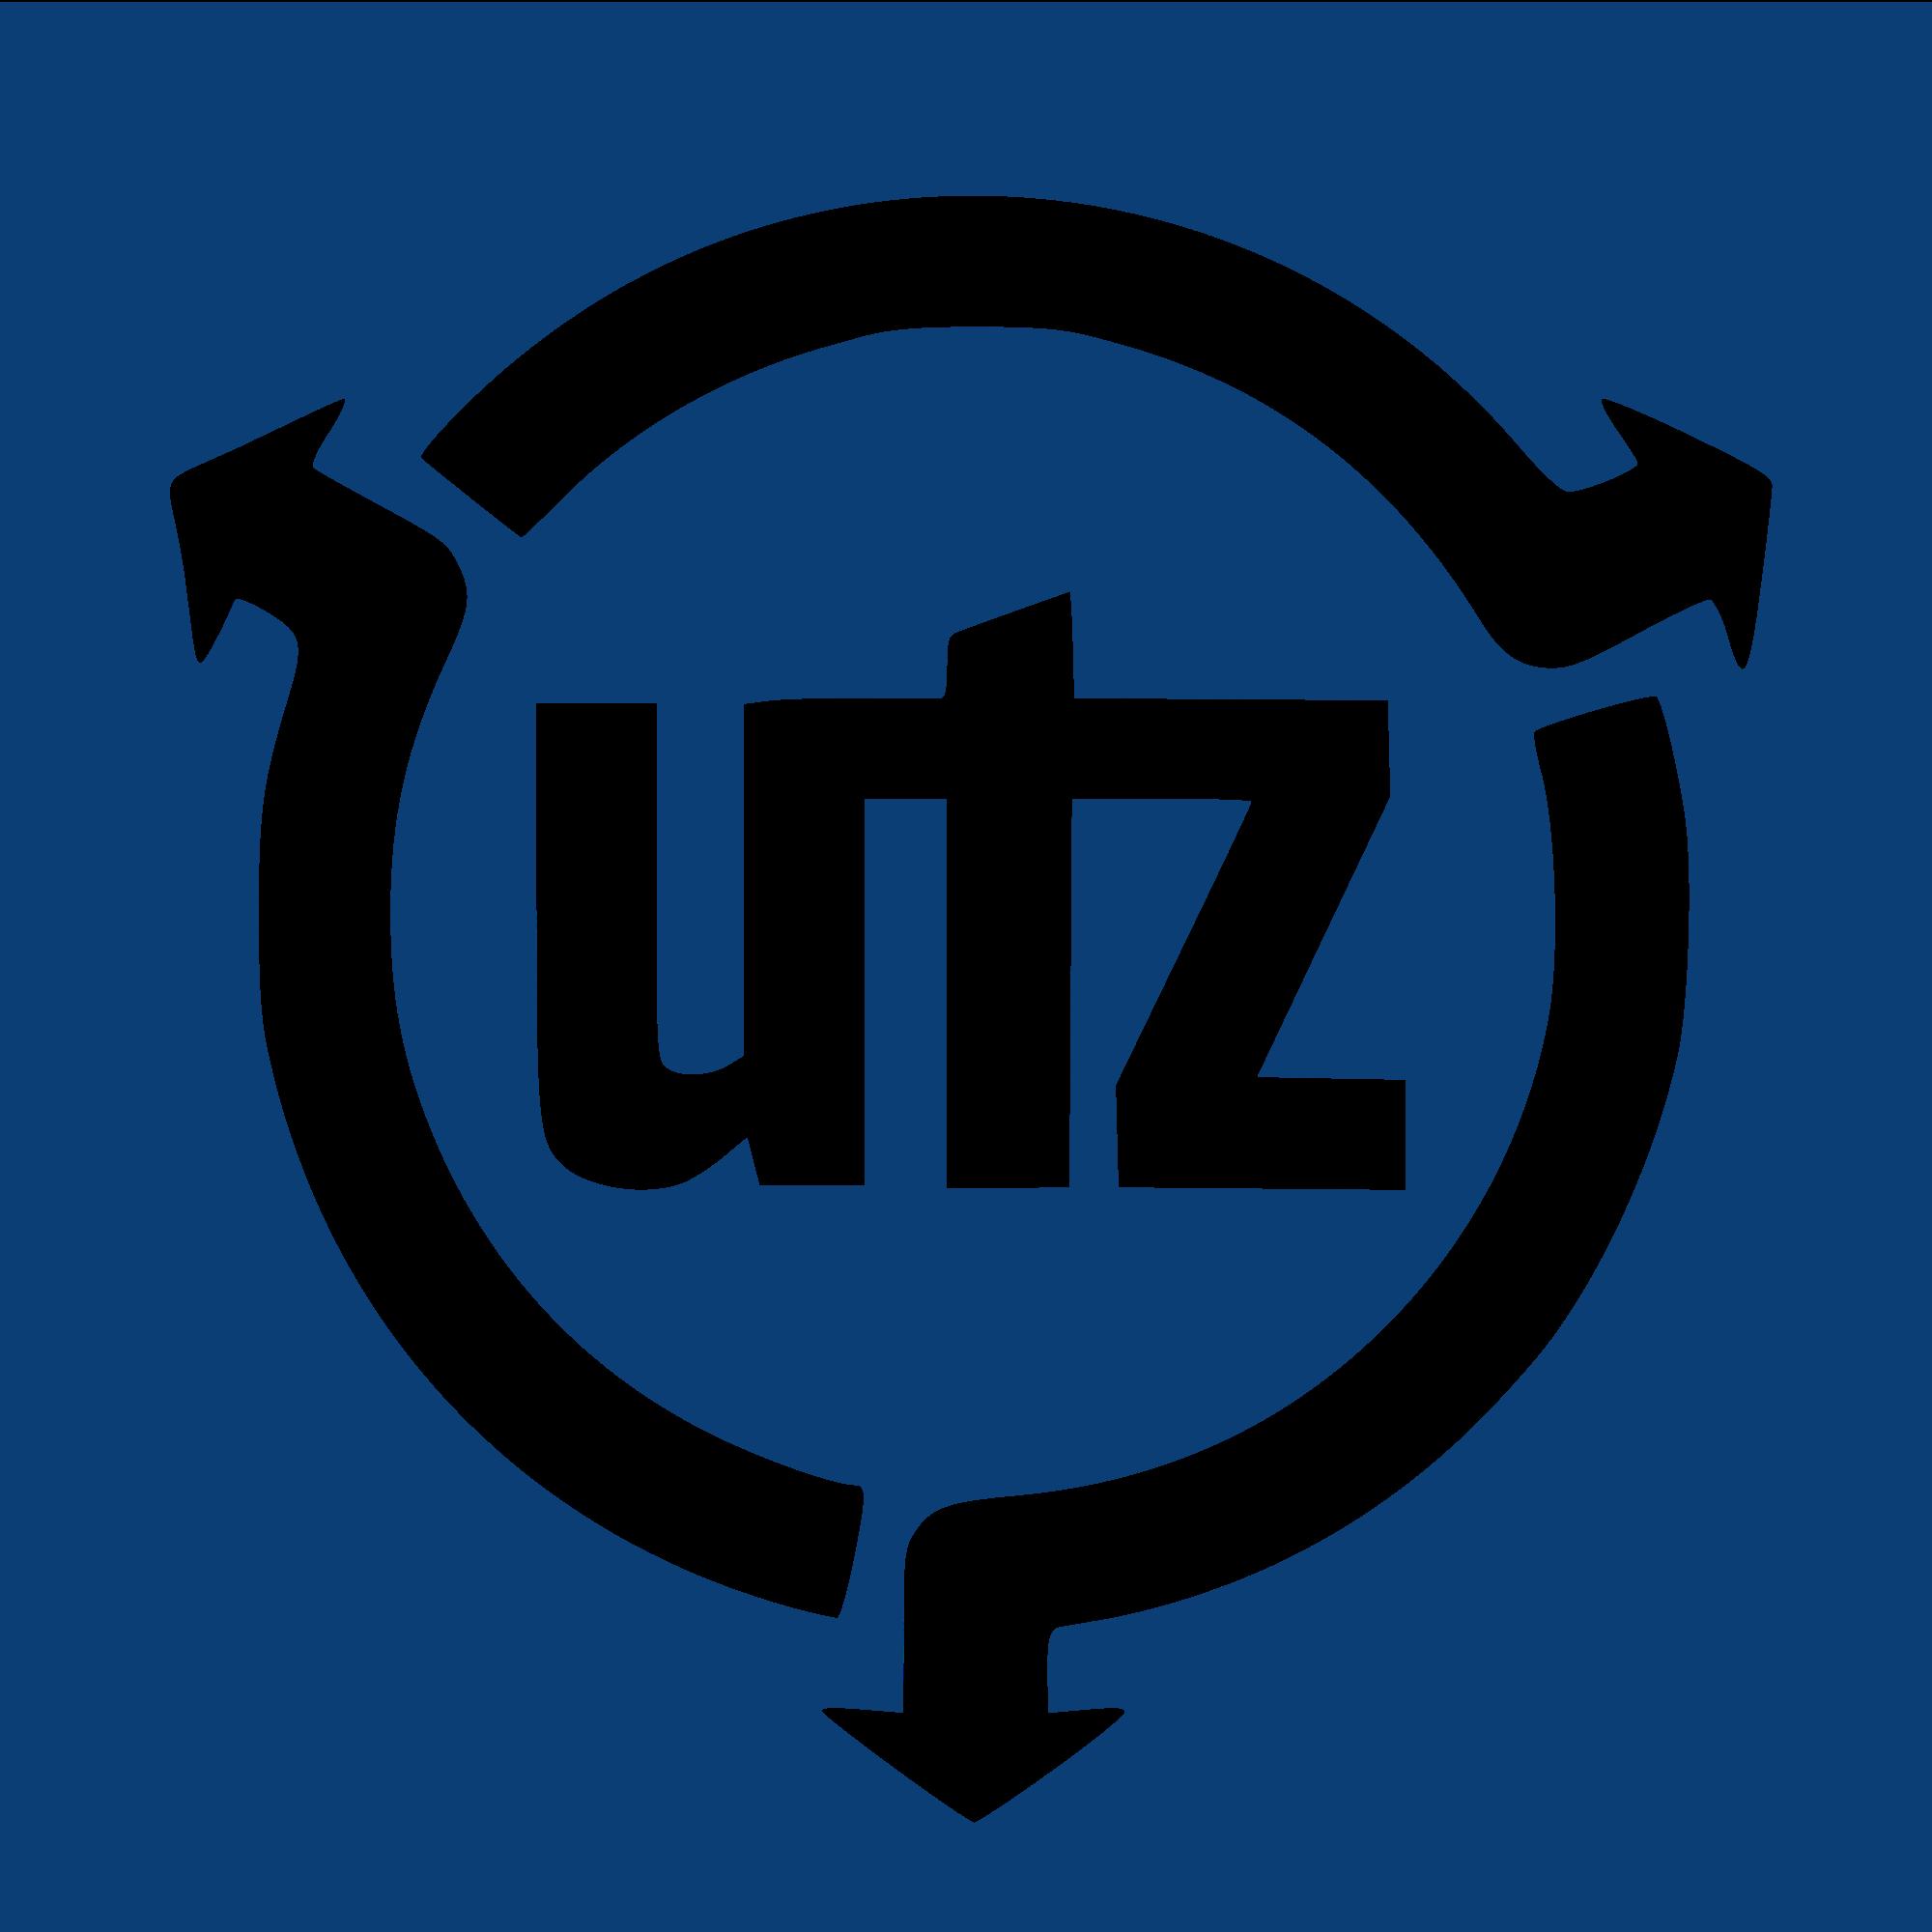 Georg UTZ logo